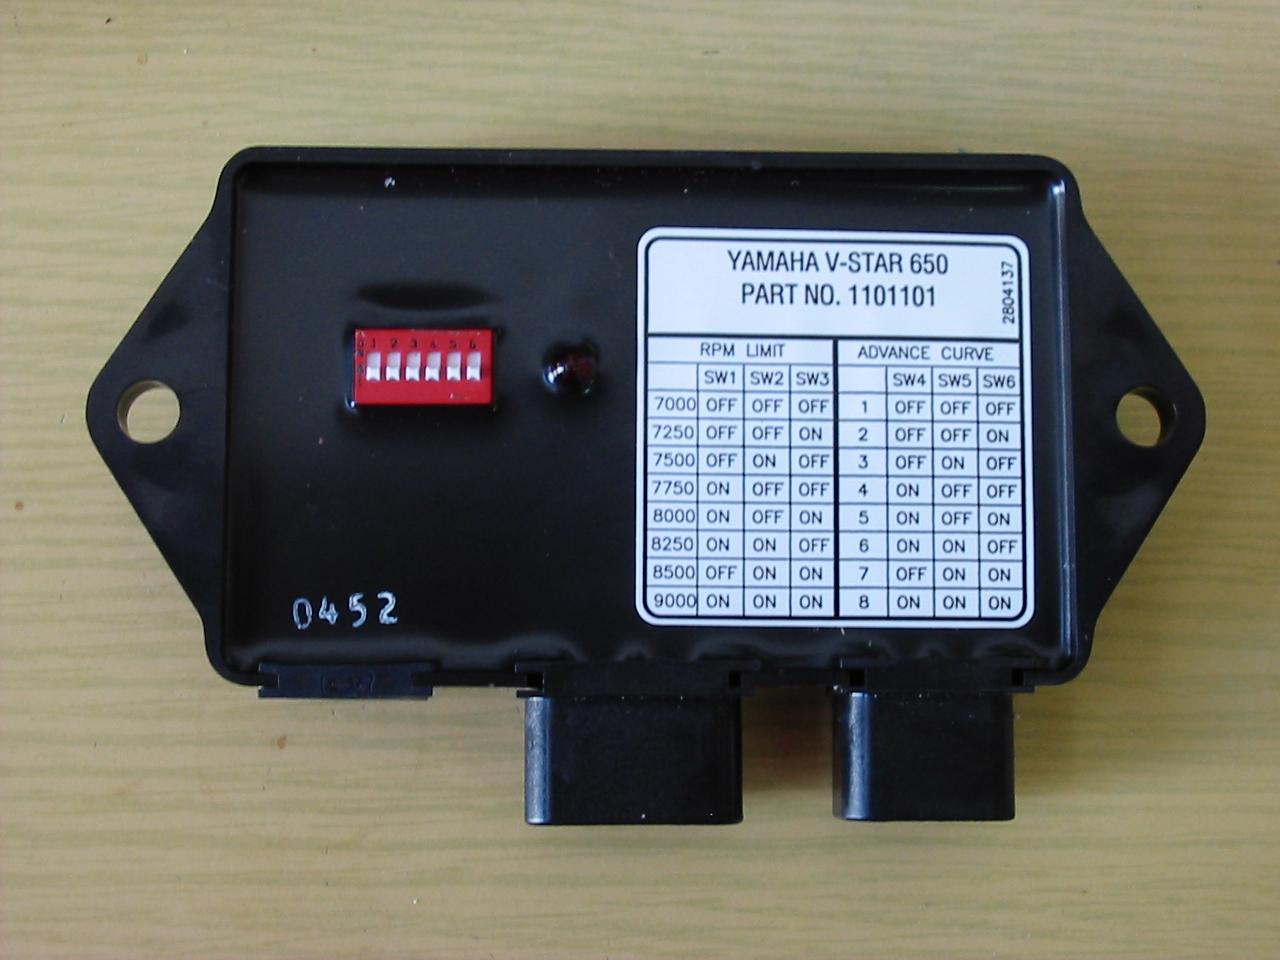 Schema Elettrico Yamaha Dragstar 650 : Faster dynatek dyna centralina parti speciali